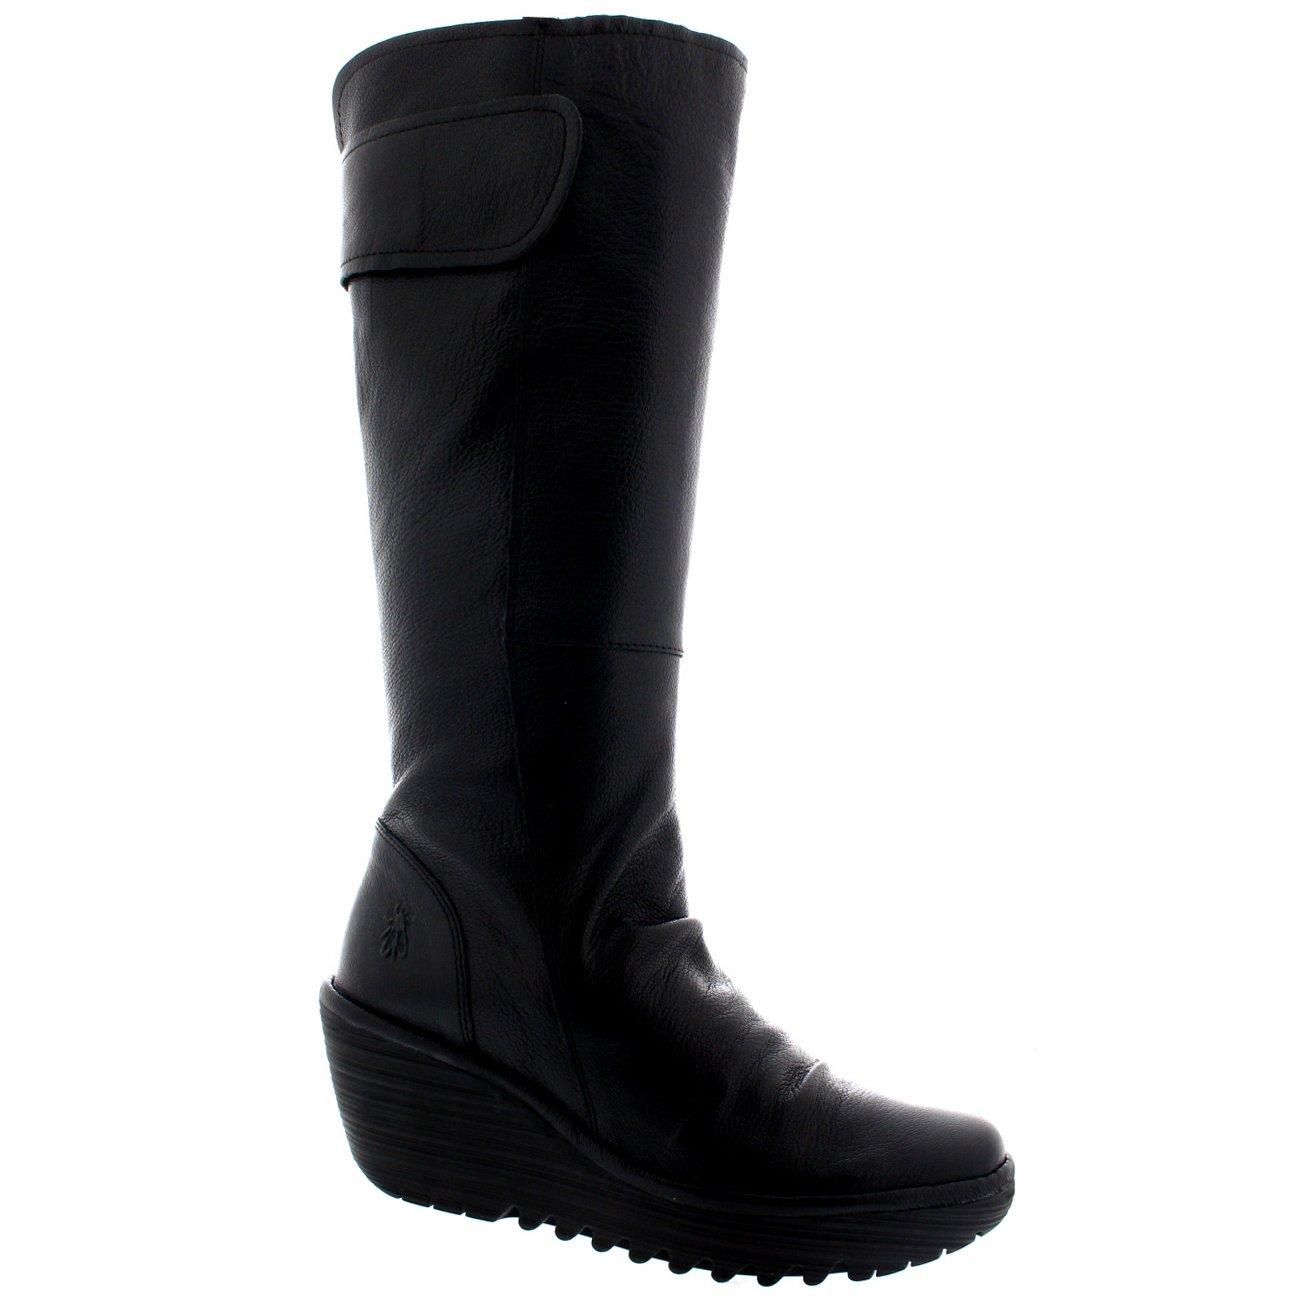 Womens Fly London Yulo Wedge Heel Leather Fashion Knee High Winter Boots B01K51GRHI US10/EU41|Black